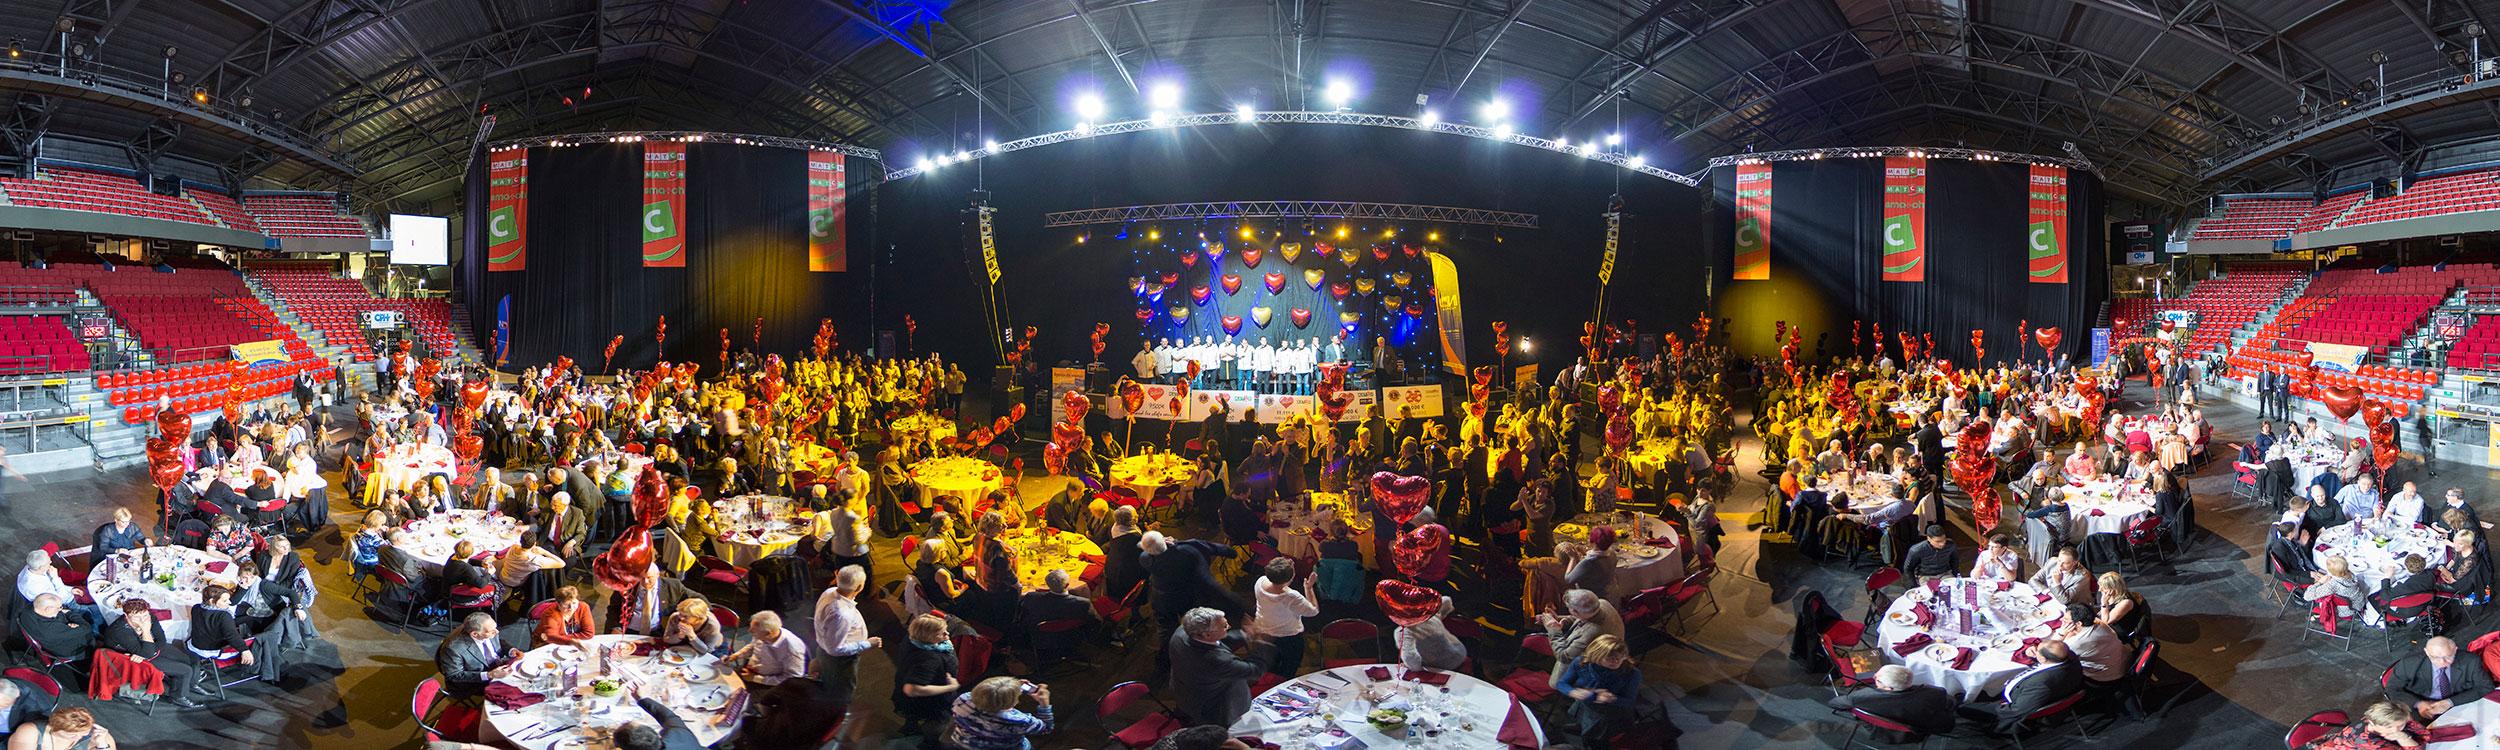 les chefs oeuvrent - service club - Lions - 2014 - Televie